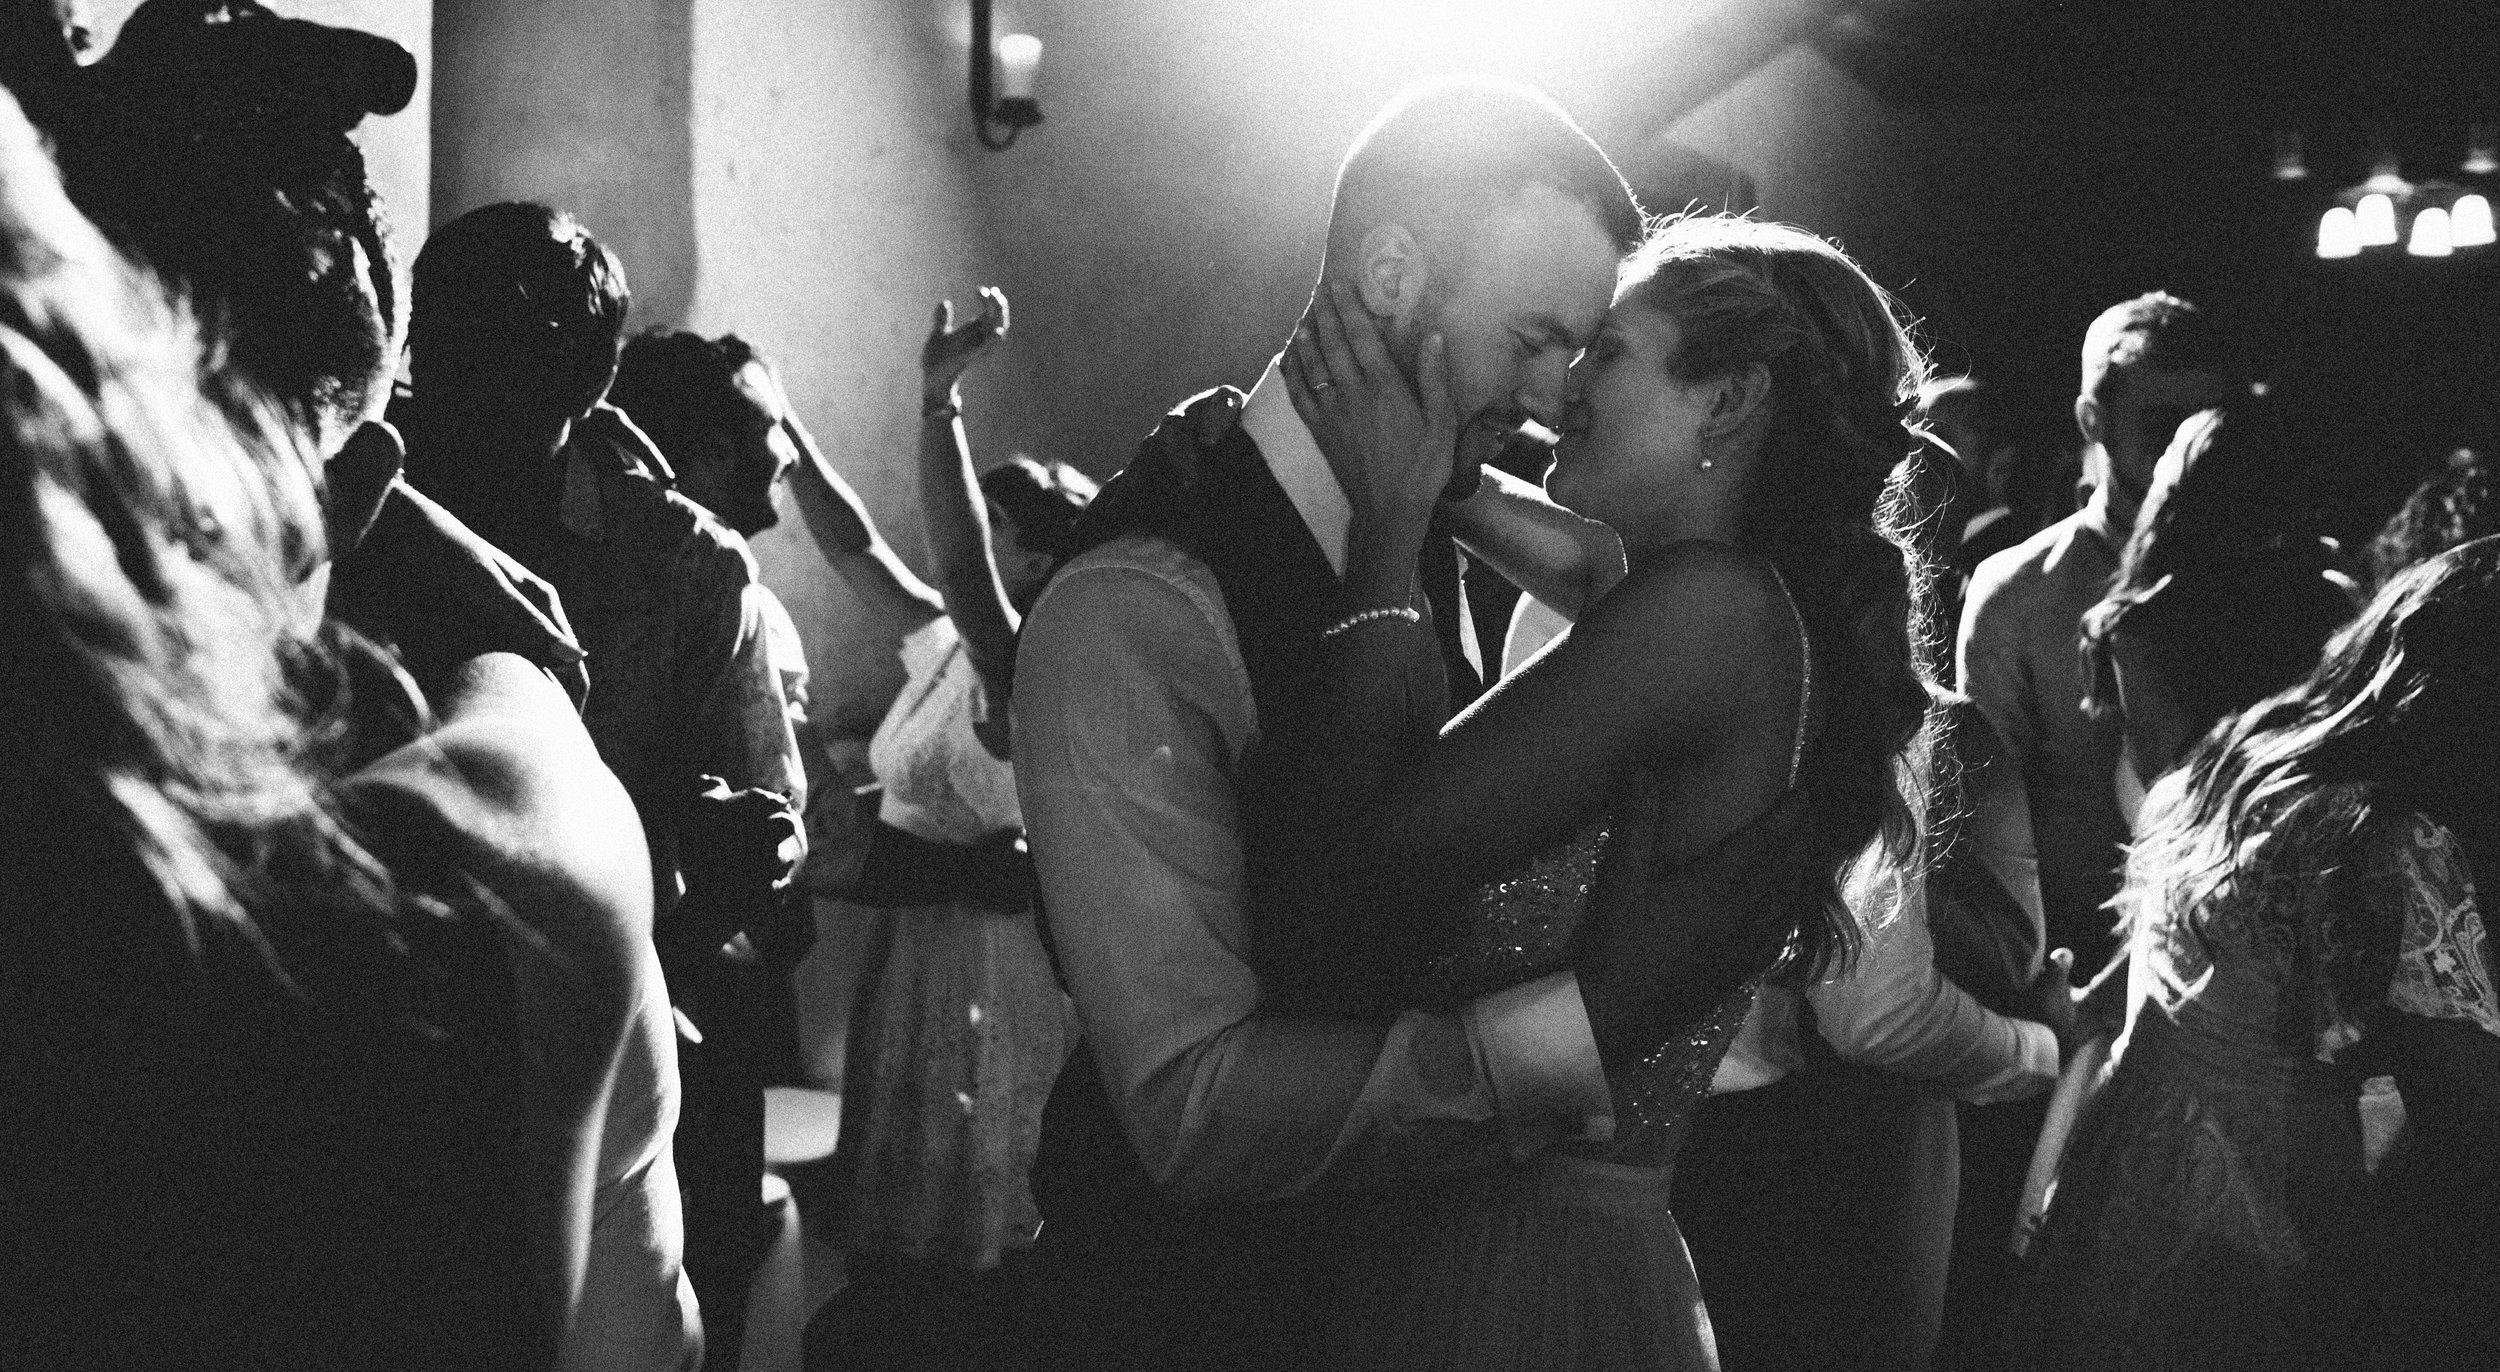 alternative wedding photography cornwall harrera images-003.jpg